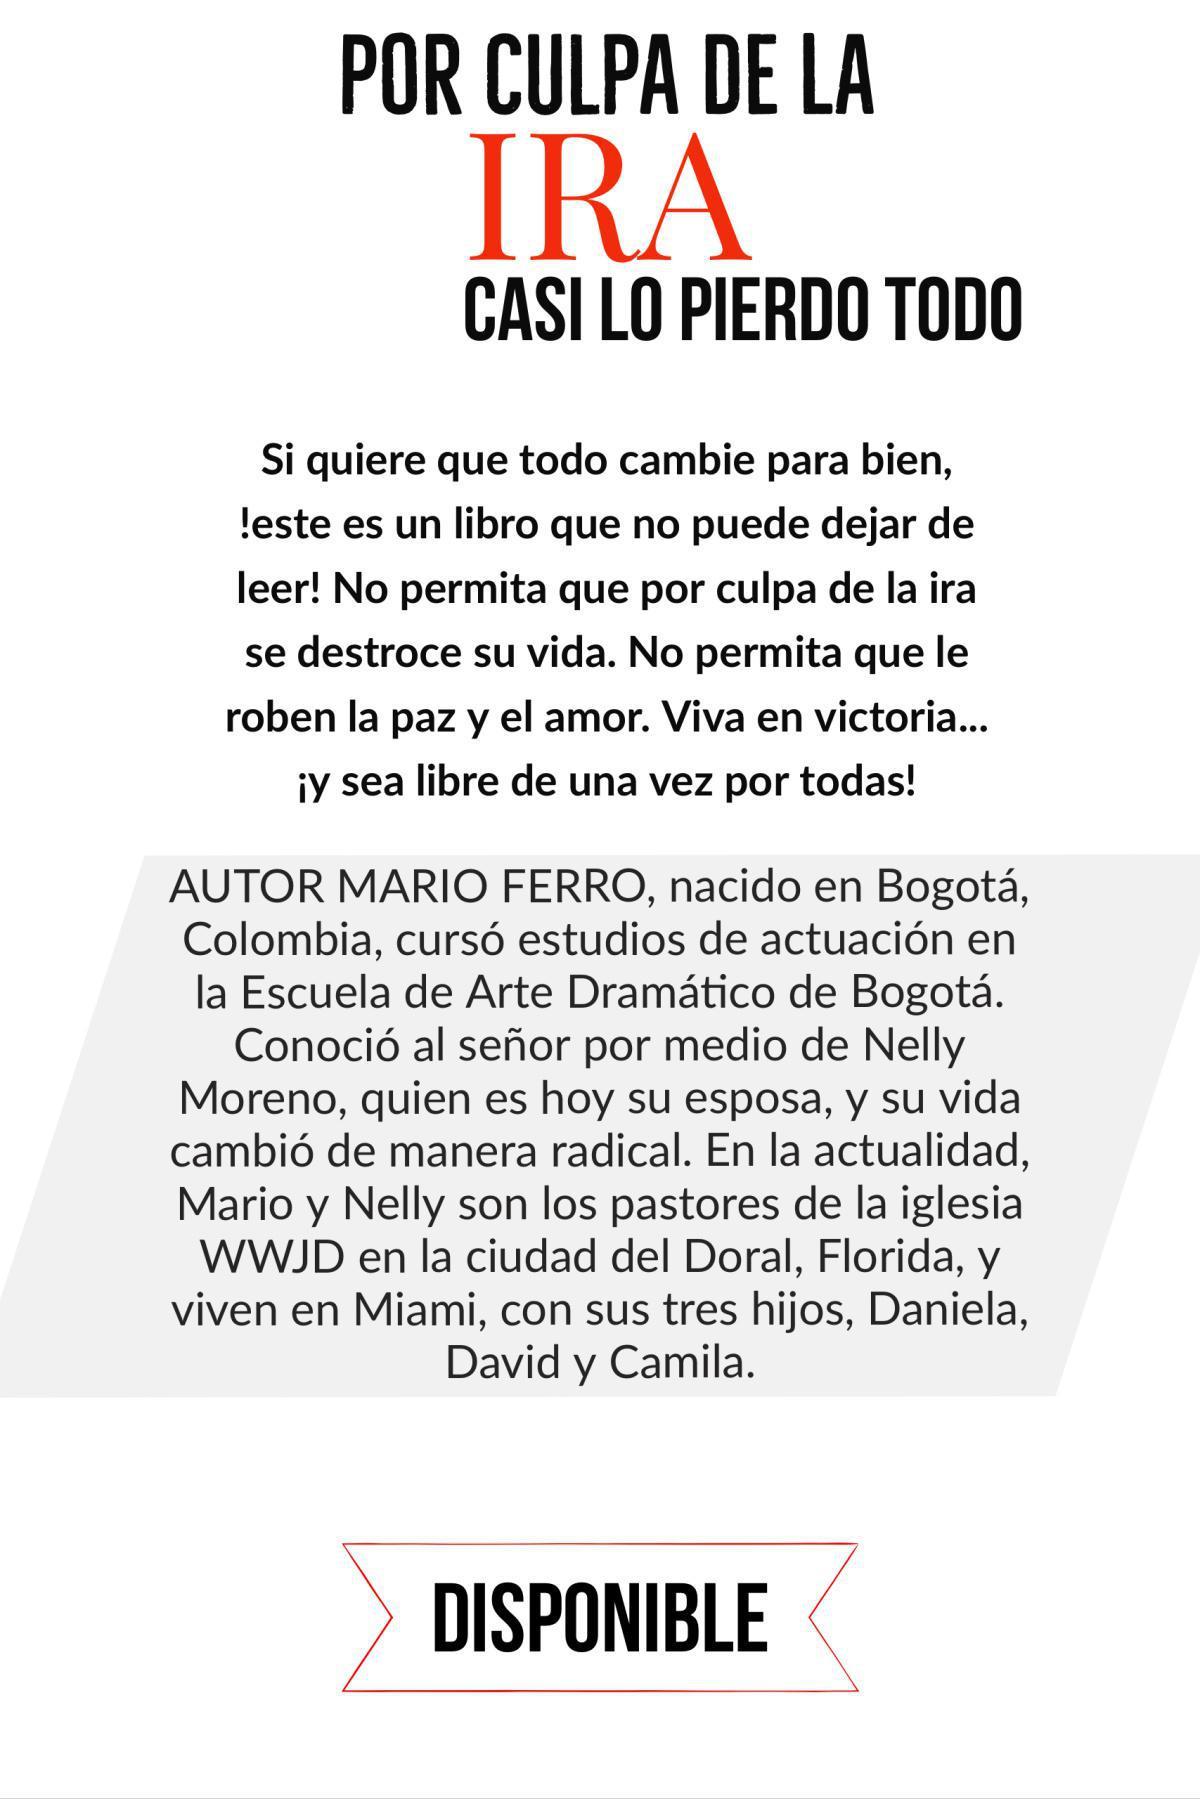 POr Culpa De La Ira Text